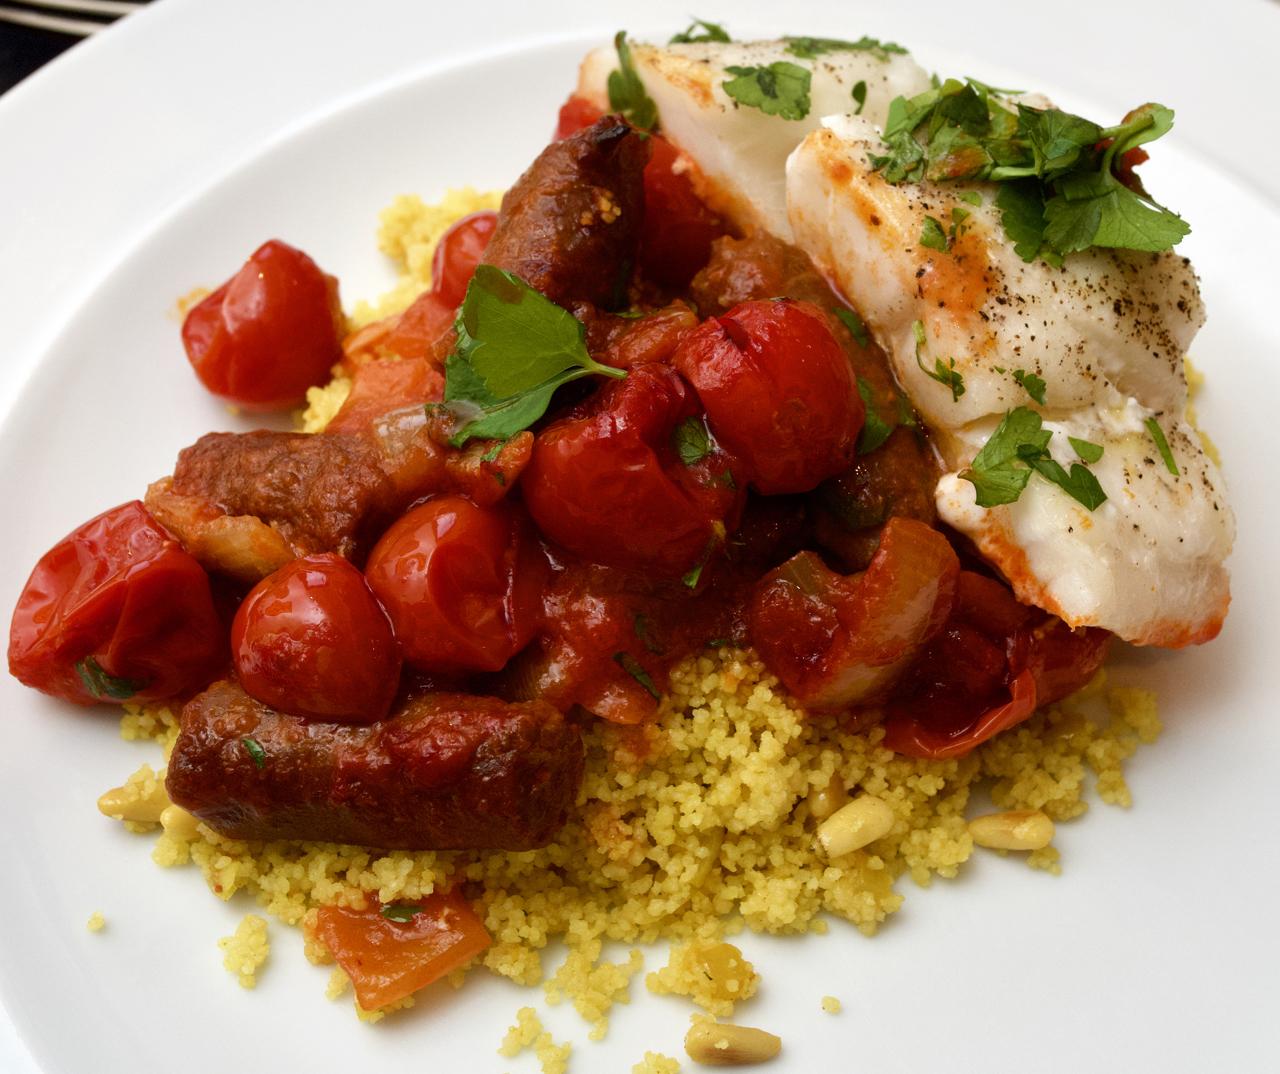 Spicy Merguez & Cod tray-bake